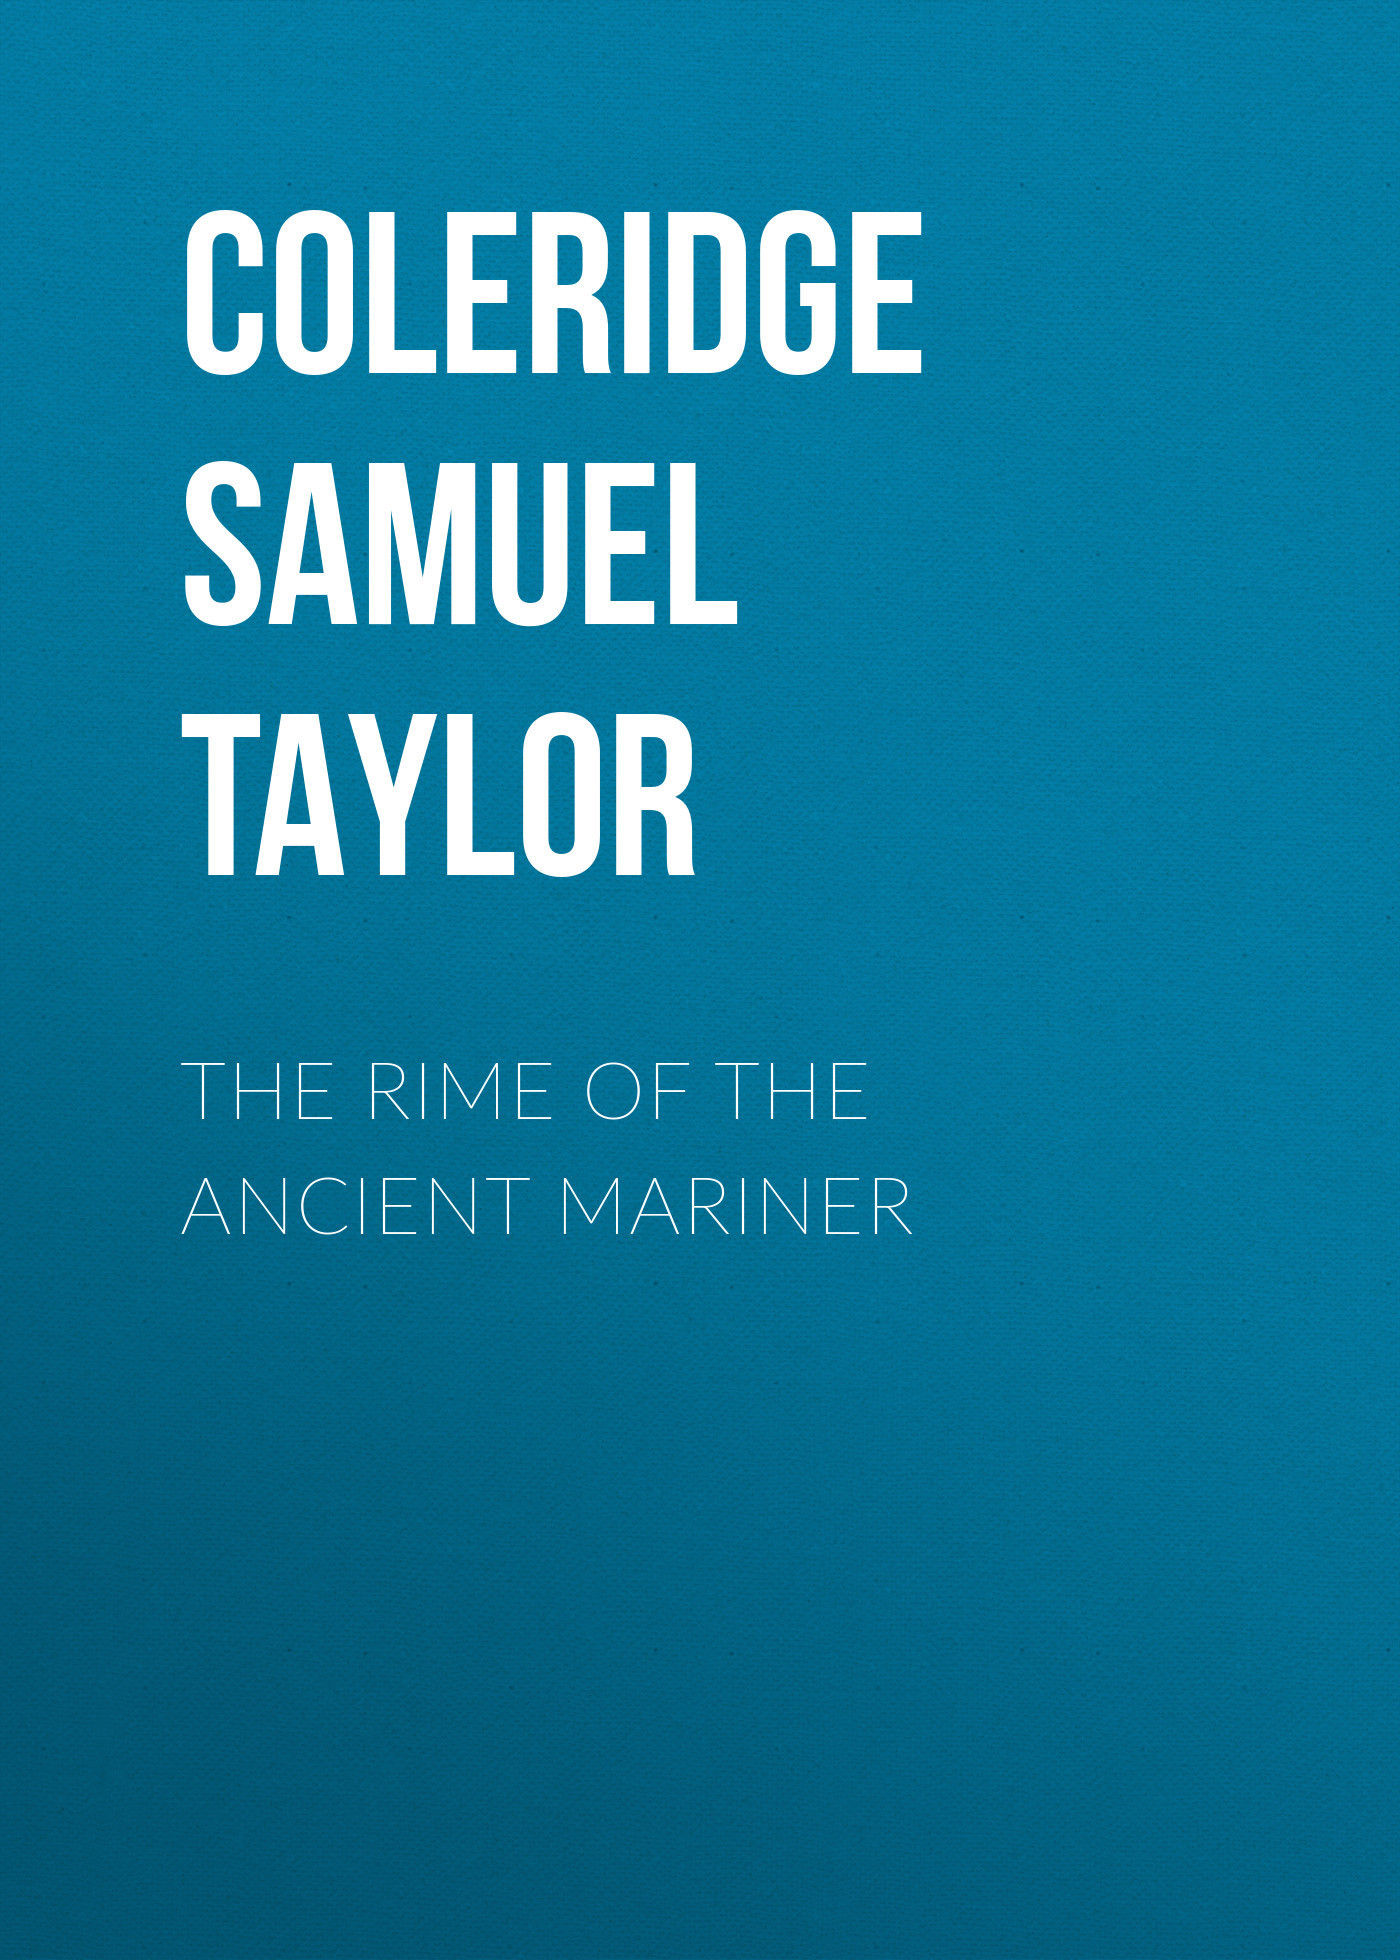 Coleridge Samuel Taylor The Rime of the Ancient Mariner